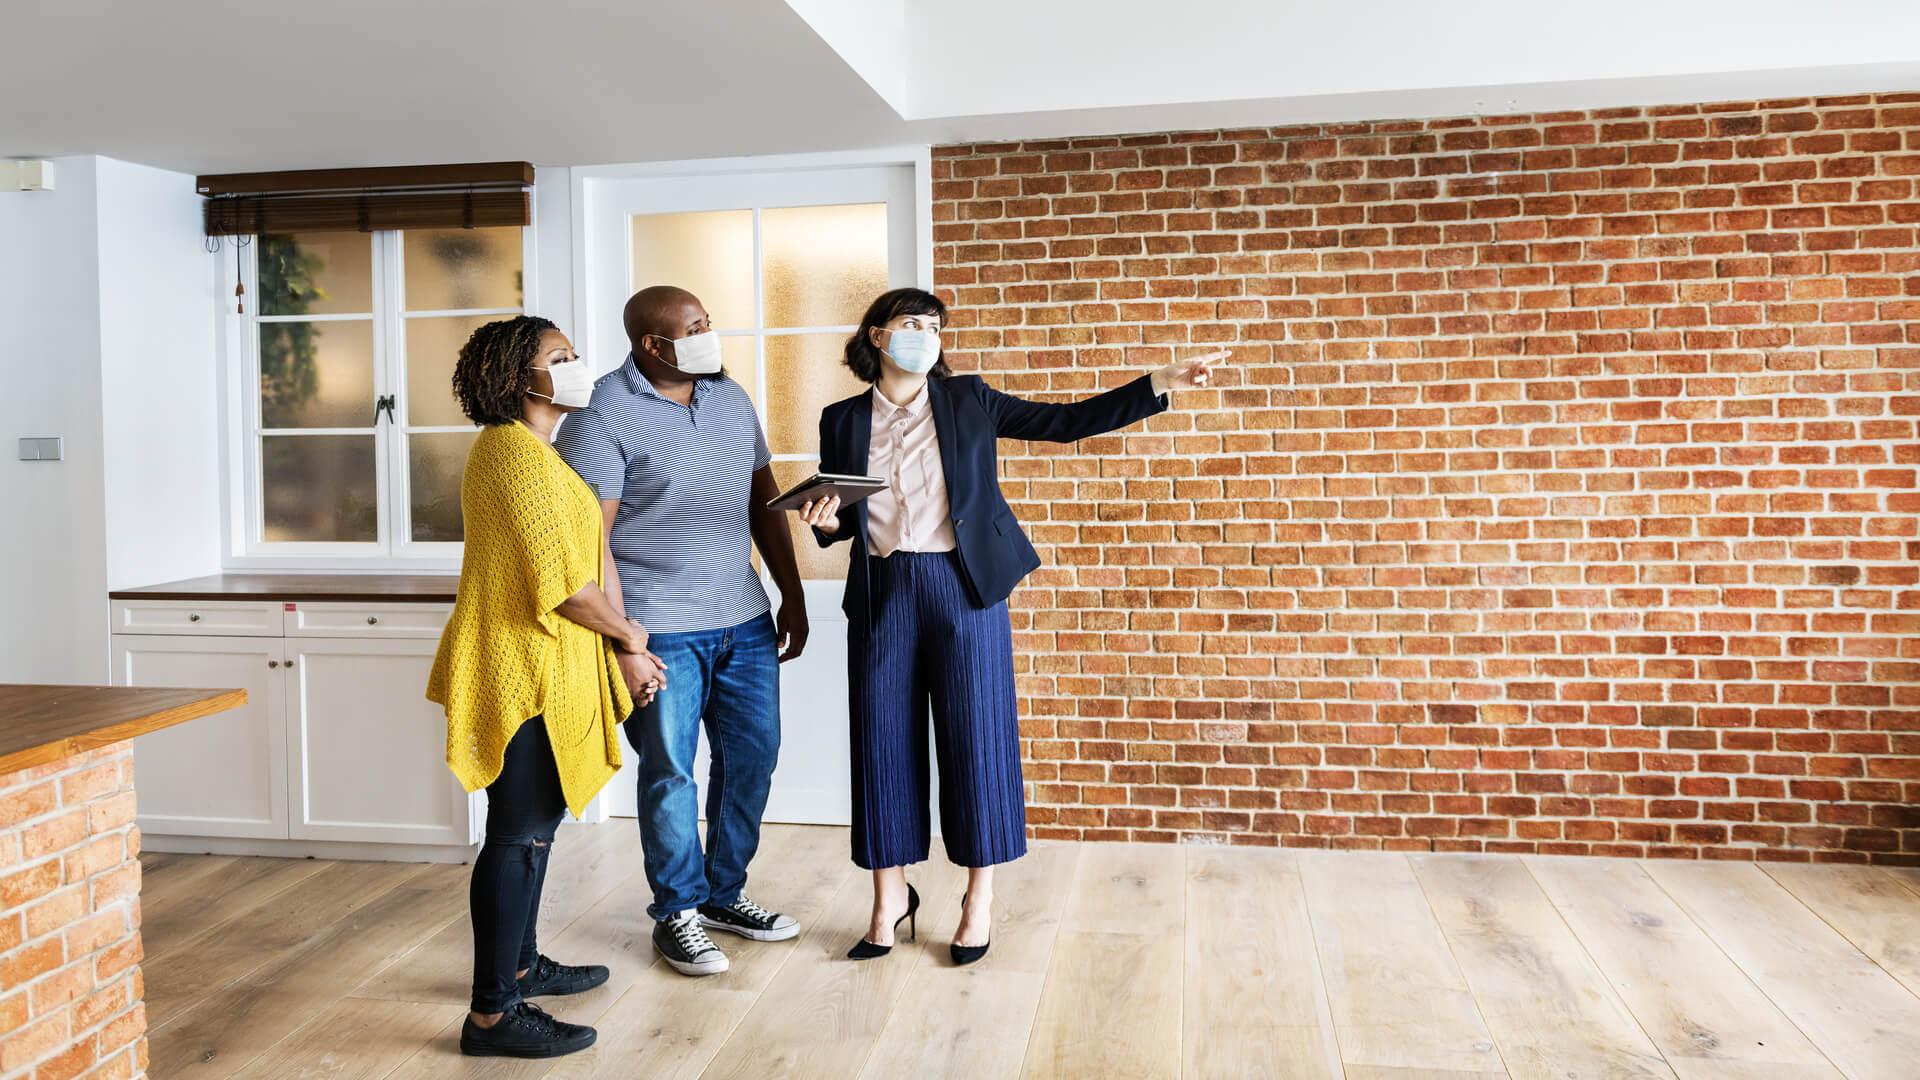 Real estate property buying